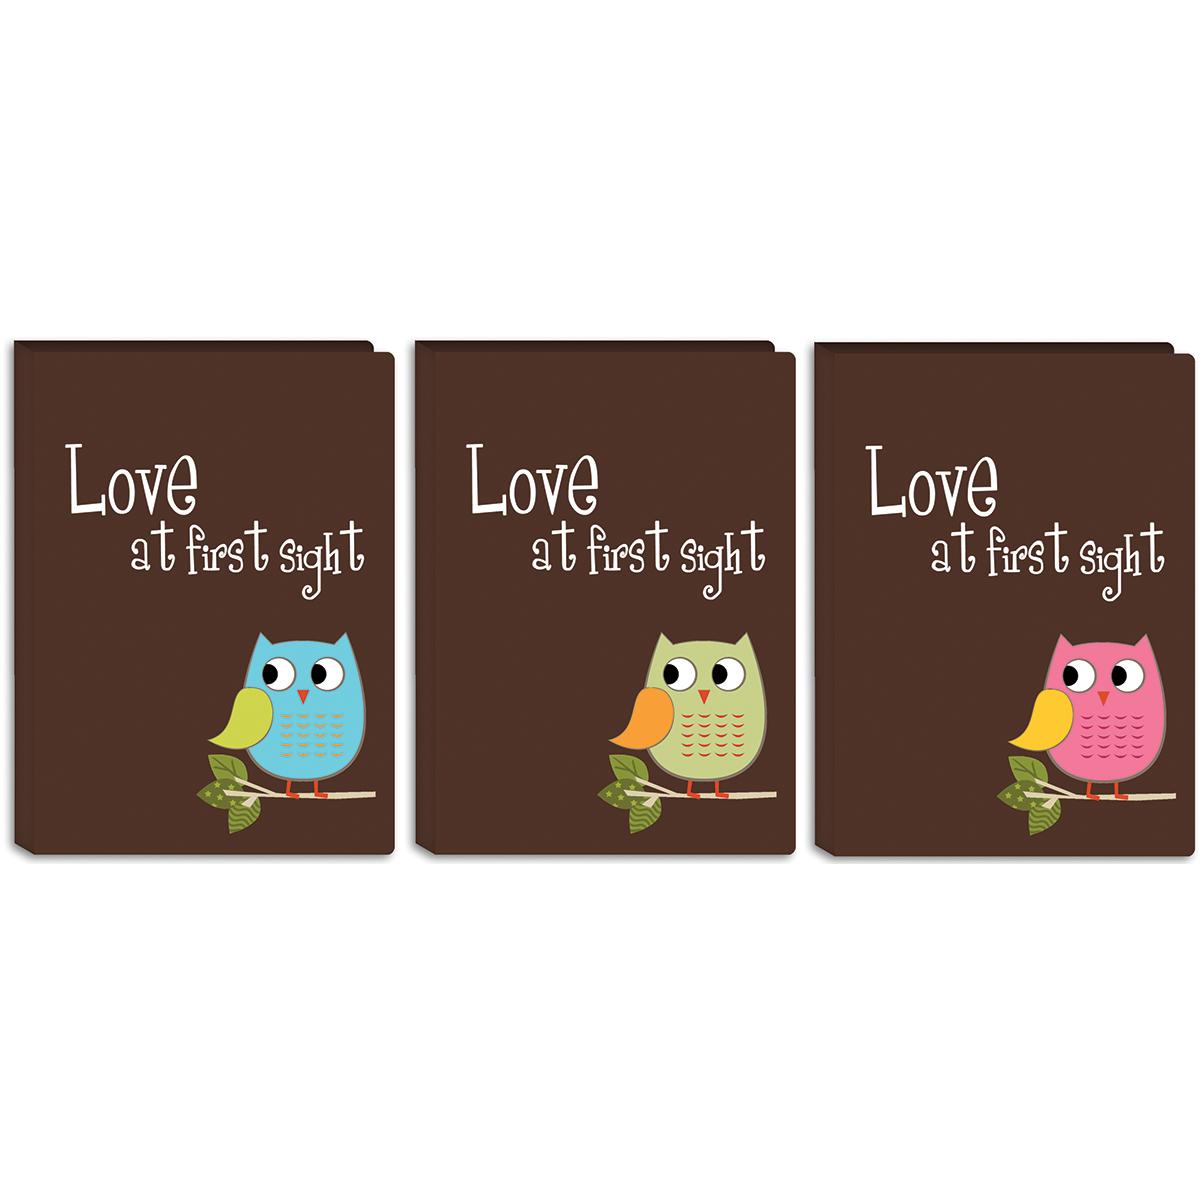 Baby Owl Brag Book Album 4x6 36 Pockets Joann